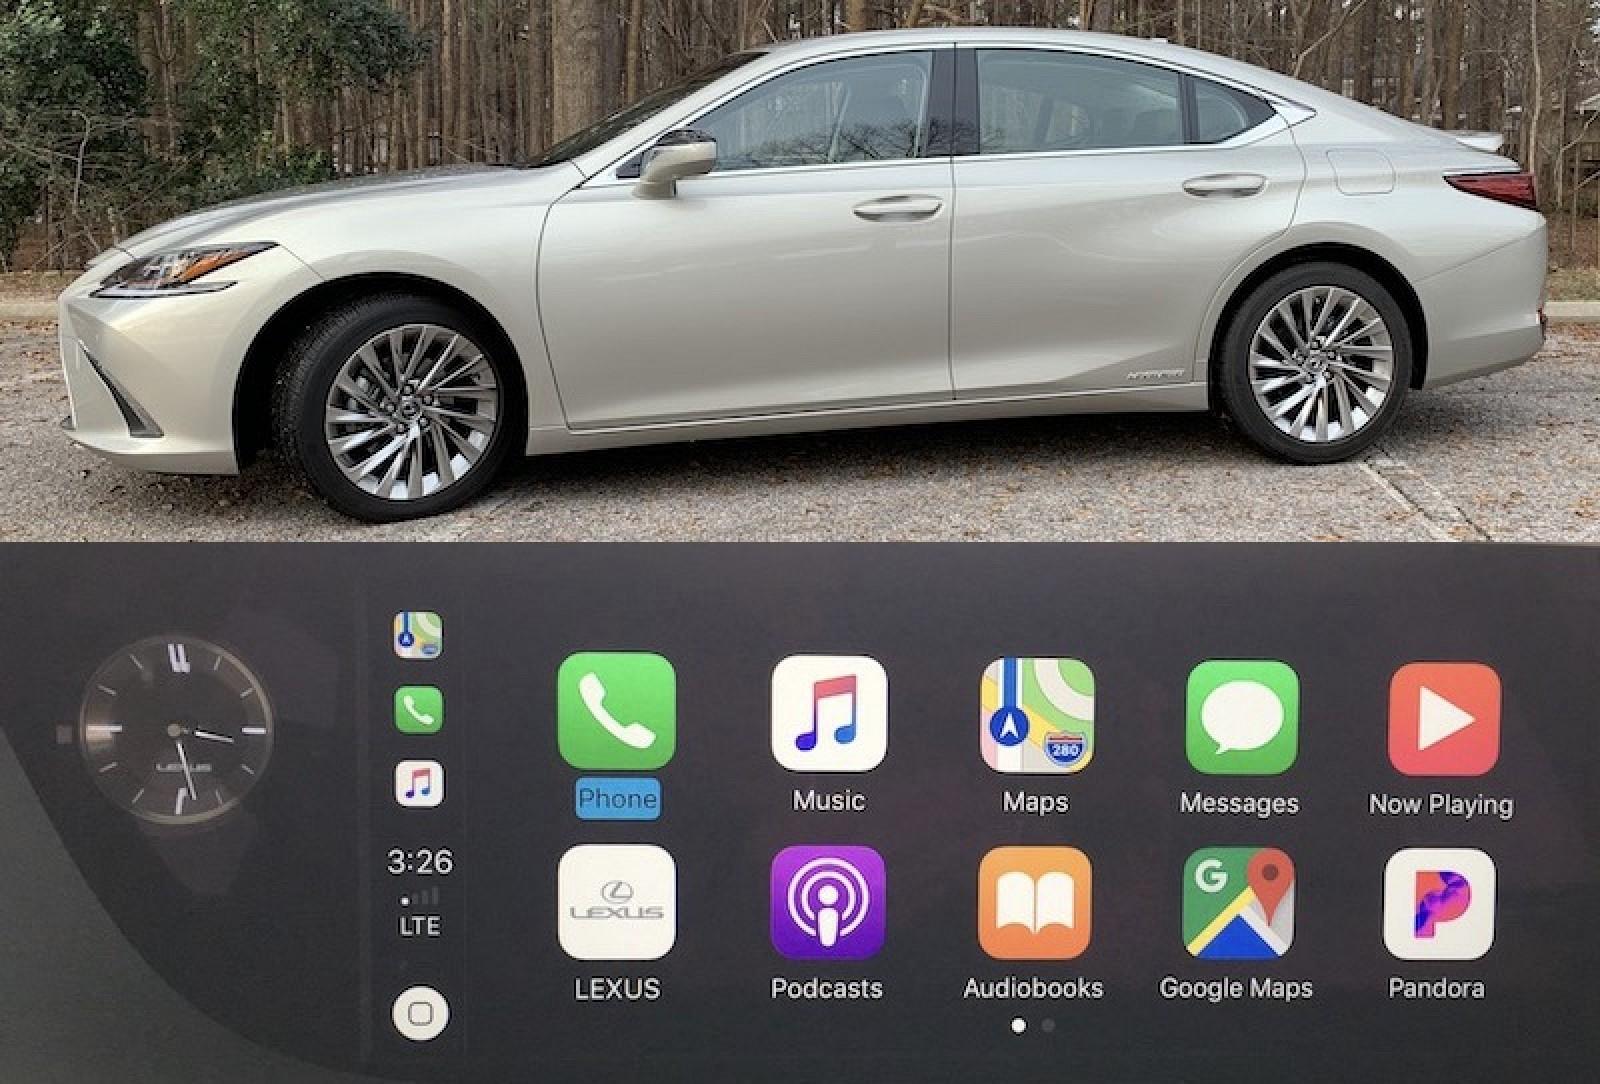 Lexus Apple Carplay >> Review 2019 Lexus Es Features Optional Widescreen Carplay